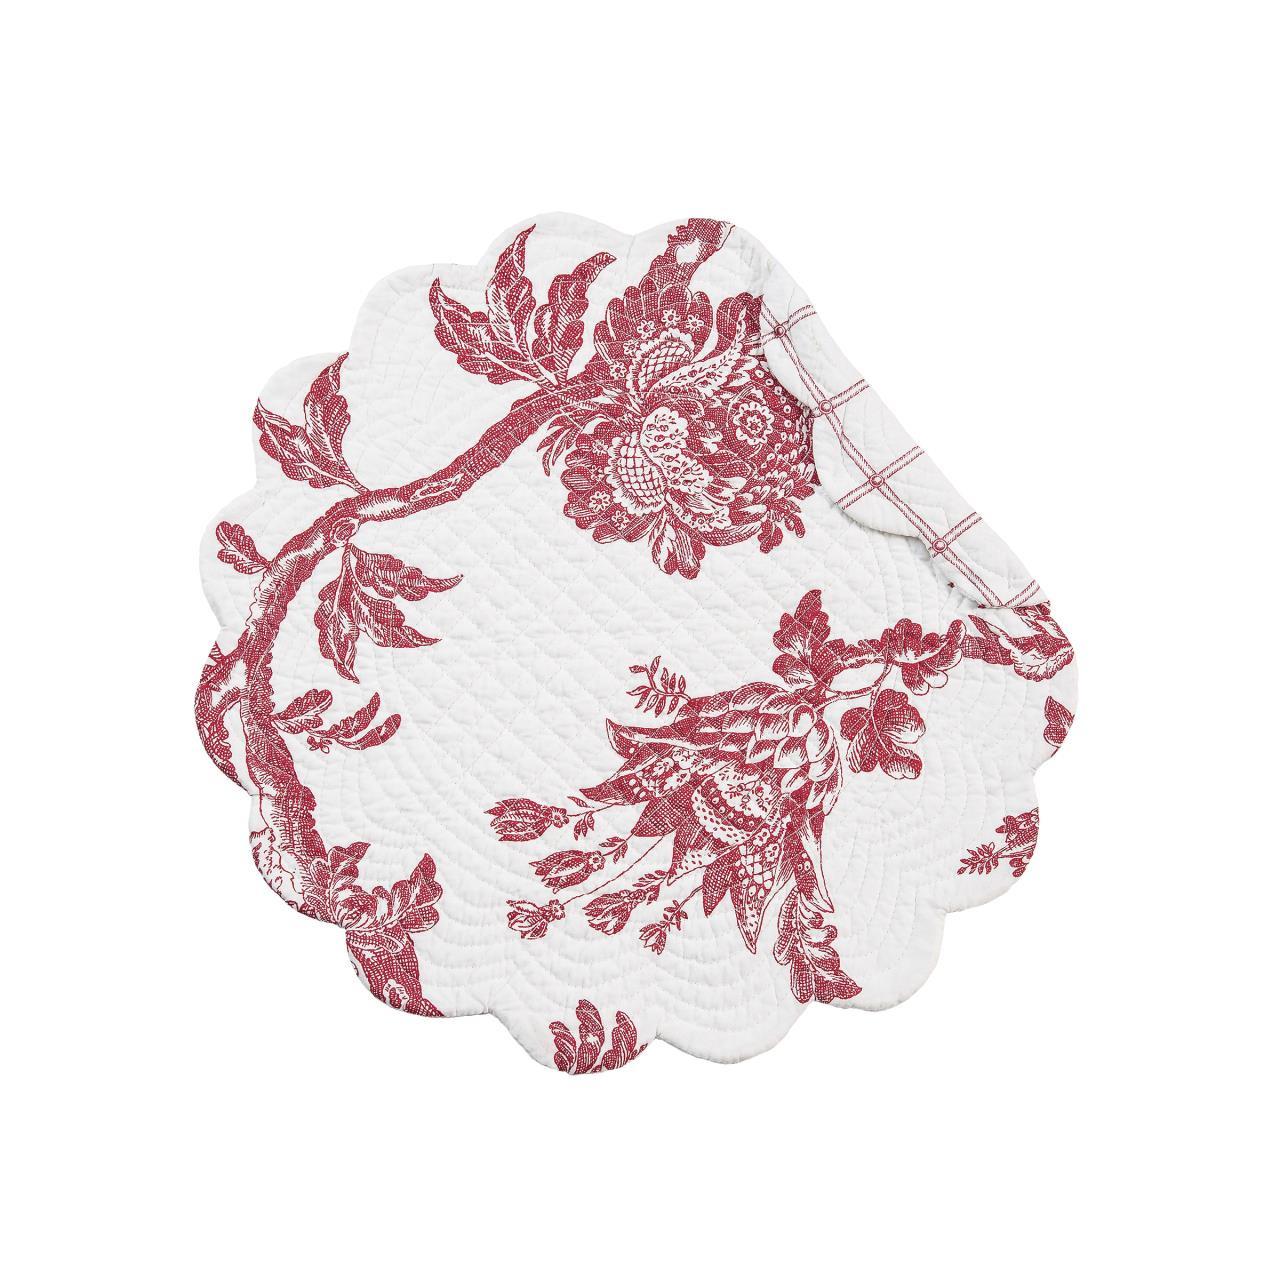 Arcadia Red Round Placemat Set - 8246303299